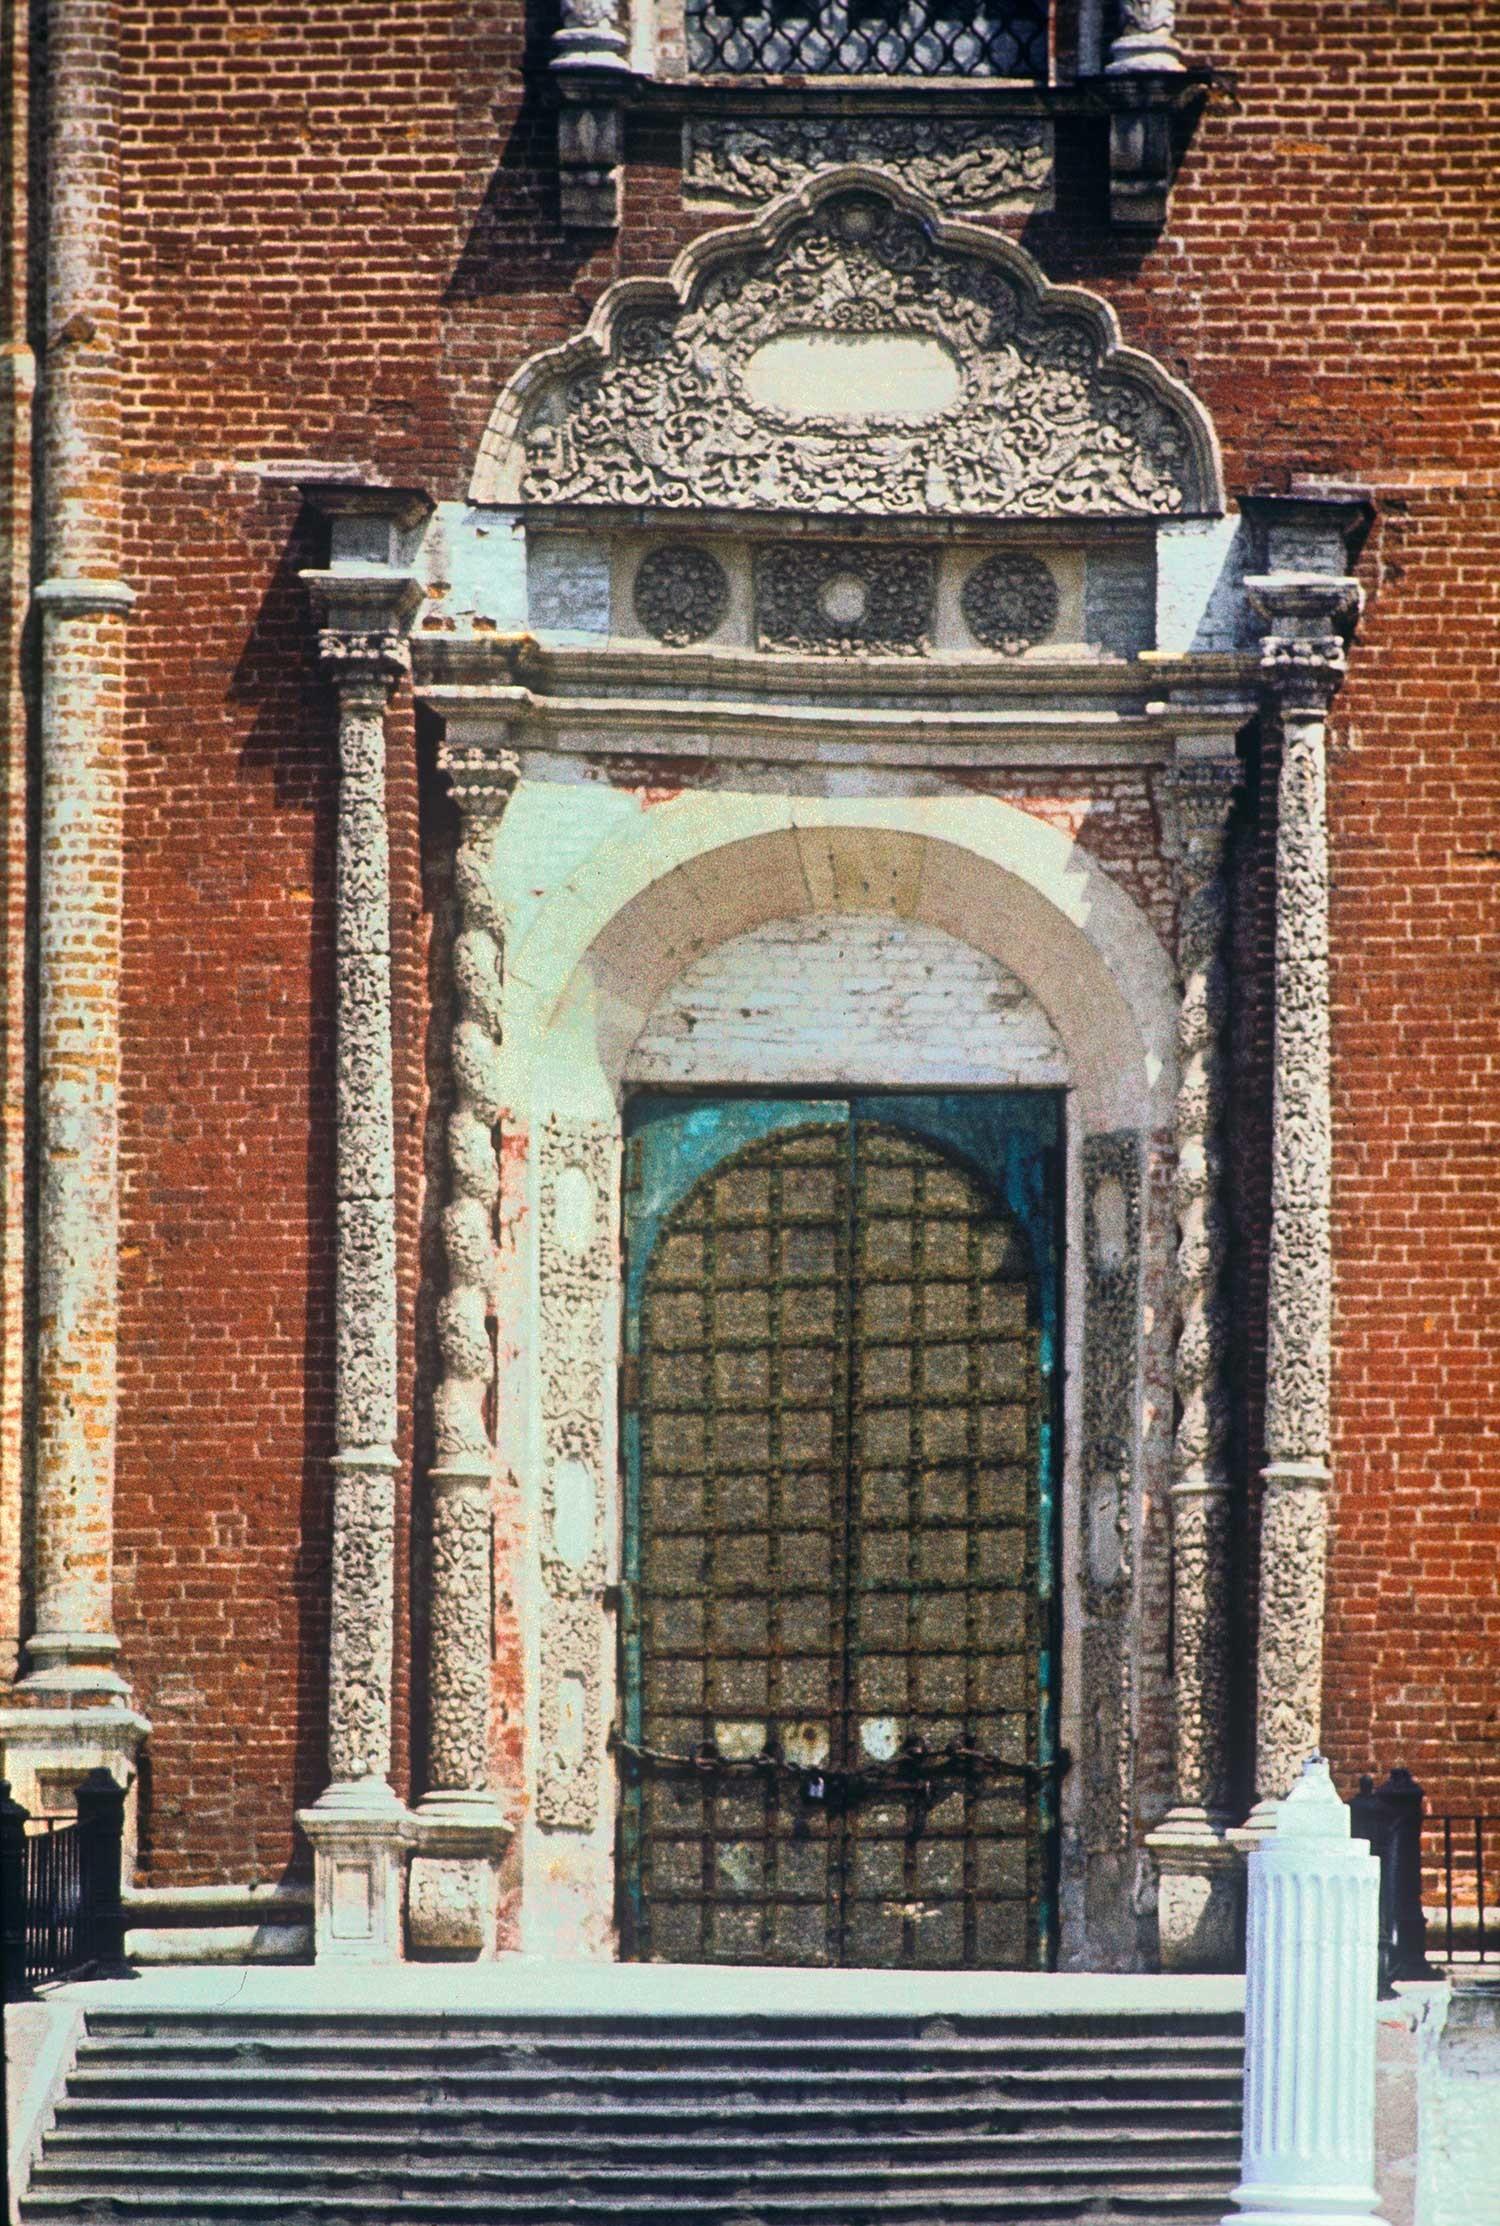 Ryazan Kremlin. Dormition Cathedral, west facade. Main portal. May 13, 1984.